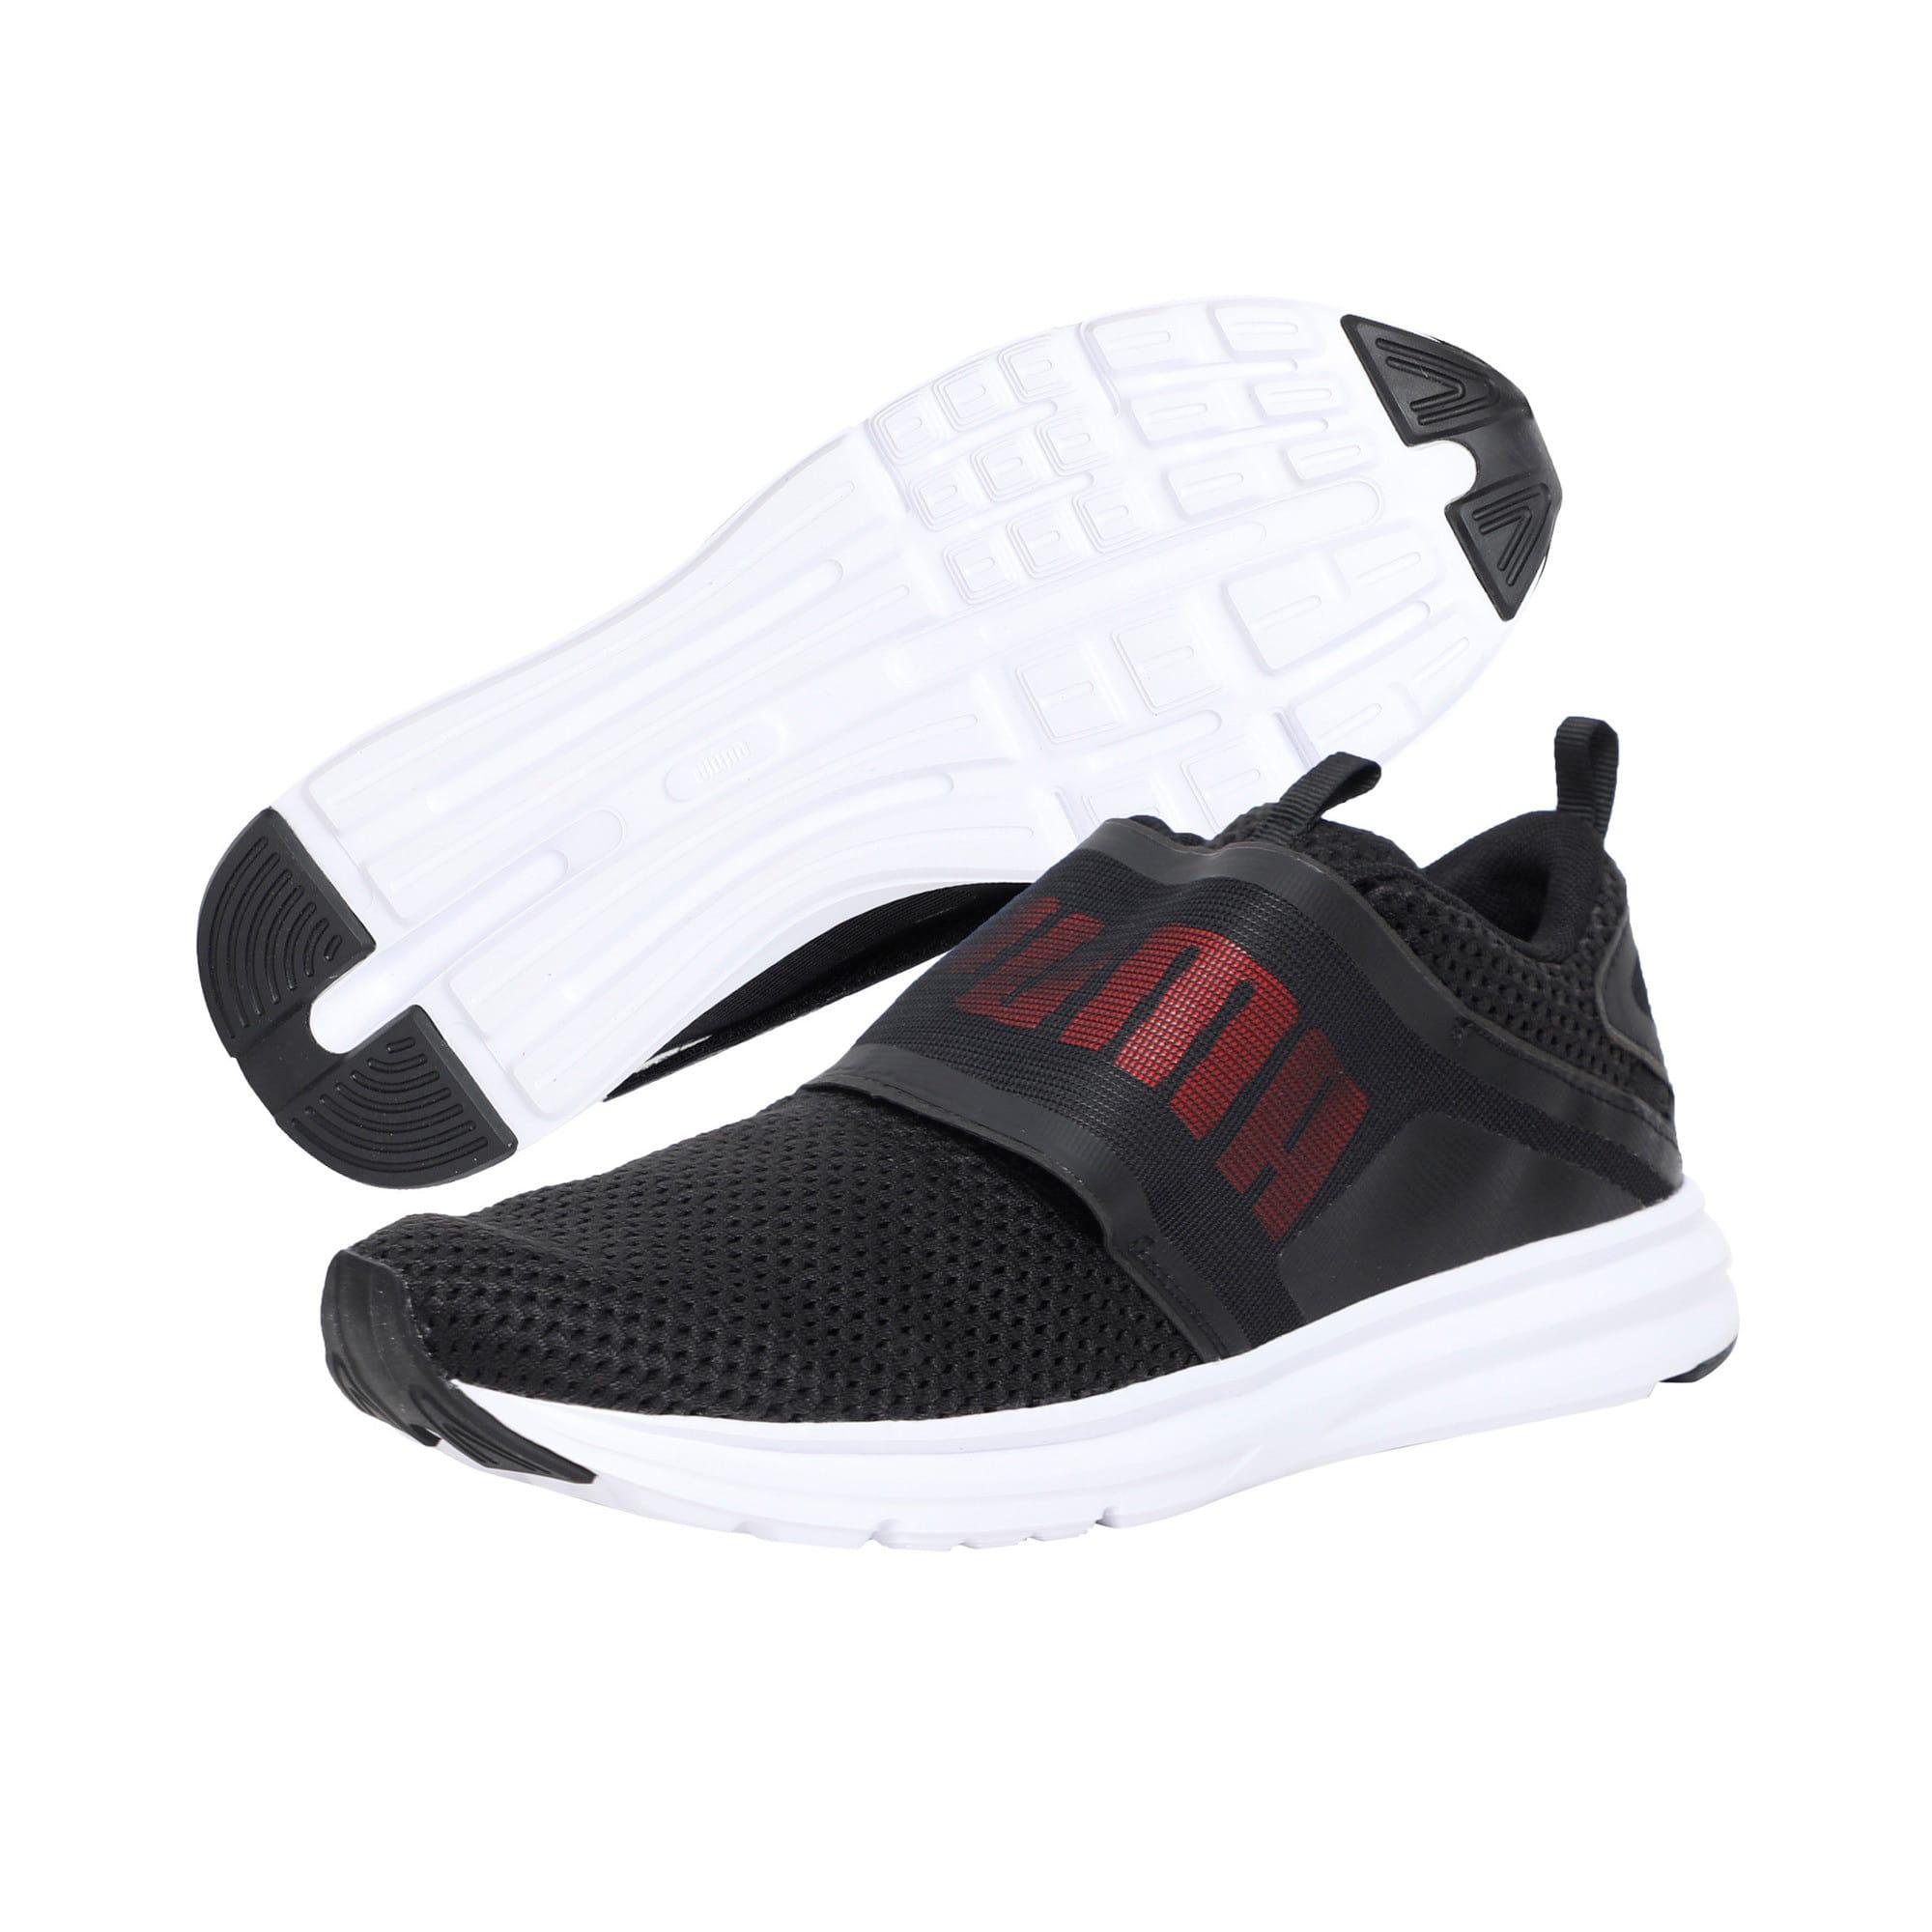 Thumbnail 2 of Enzo Strap Mesh Men's Running Shoes, Puma Black-Flame Scarlet, medium-IND